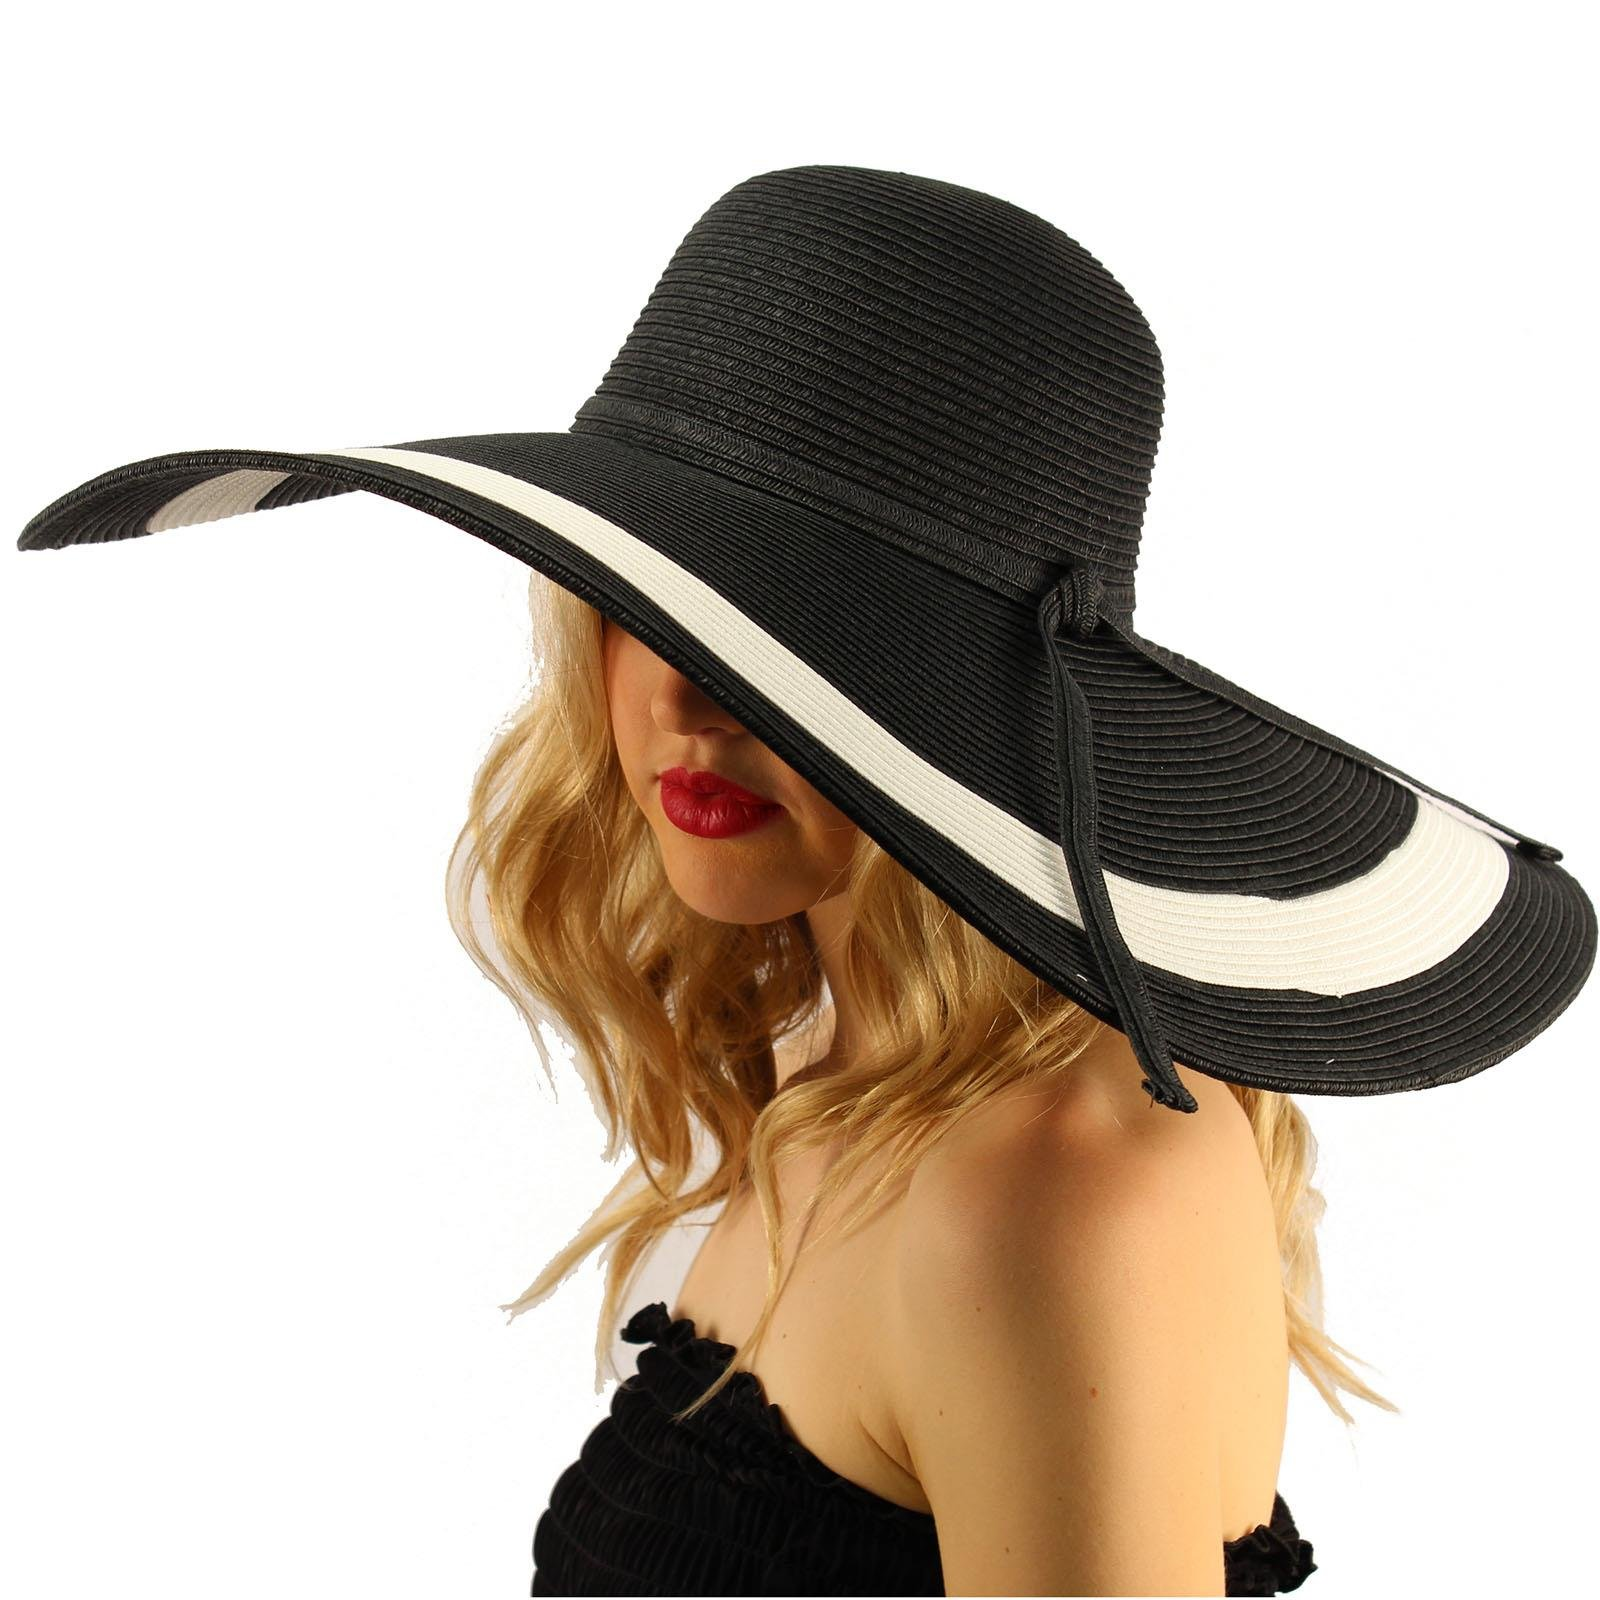 Summer Elegant Derby Big Super Wide Brim 8'' Brim Floppy Sun Beach Dress Hat 7-1/4'' Brim 2 Tone - Black